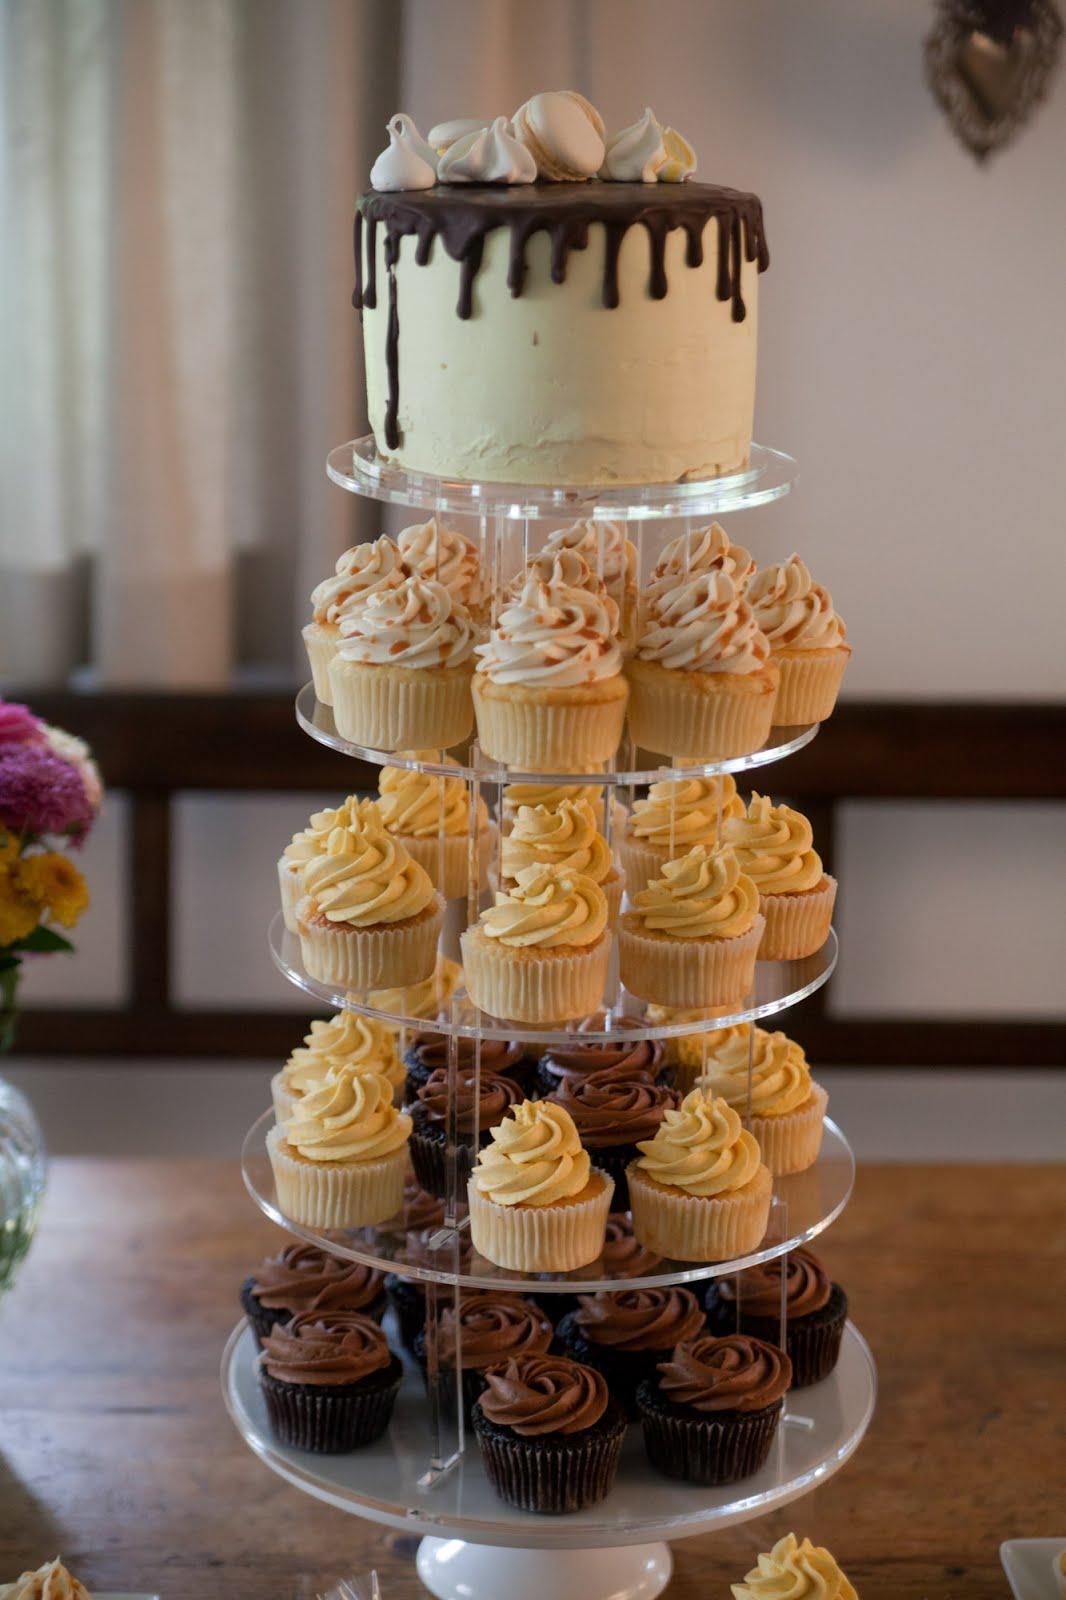 hochzeits cupcake turm mit dripcake. Black Bedroom Furniture Sets. Home Design Ideas